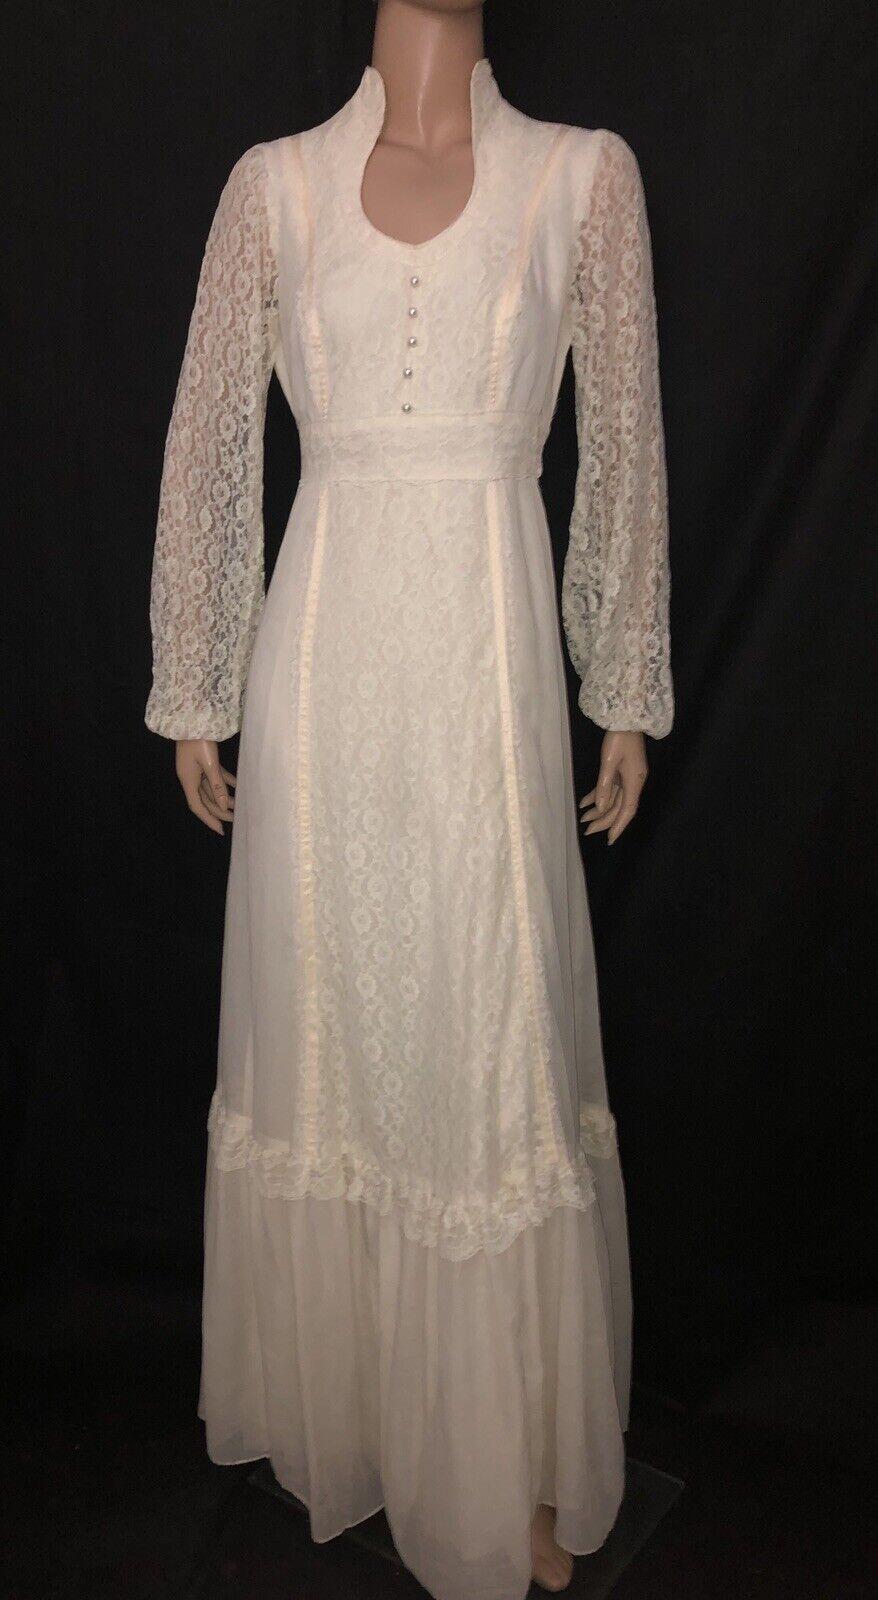 Vtg Gunne Sax Style Wedding Dress Ivory Gauze Lace Maxi Gown Ruffle Victorian 36